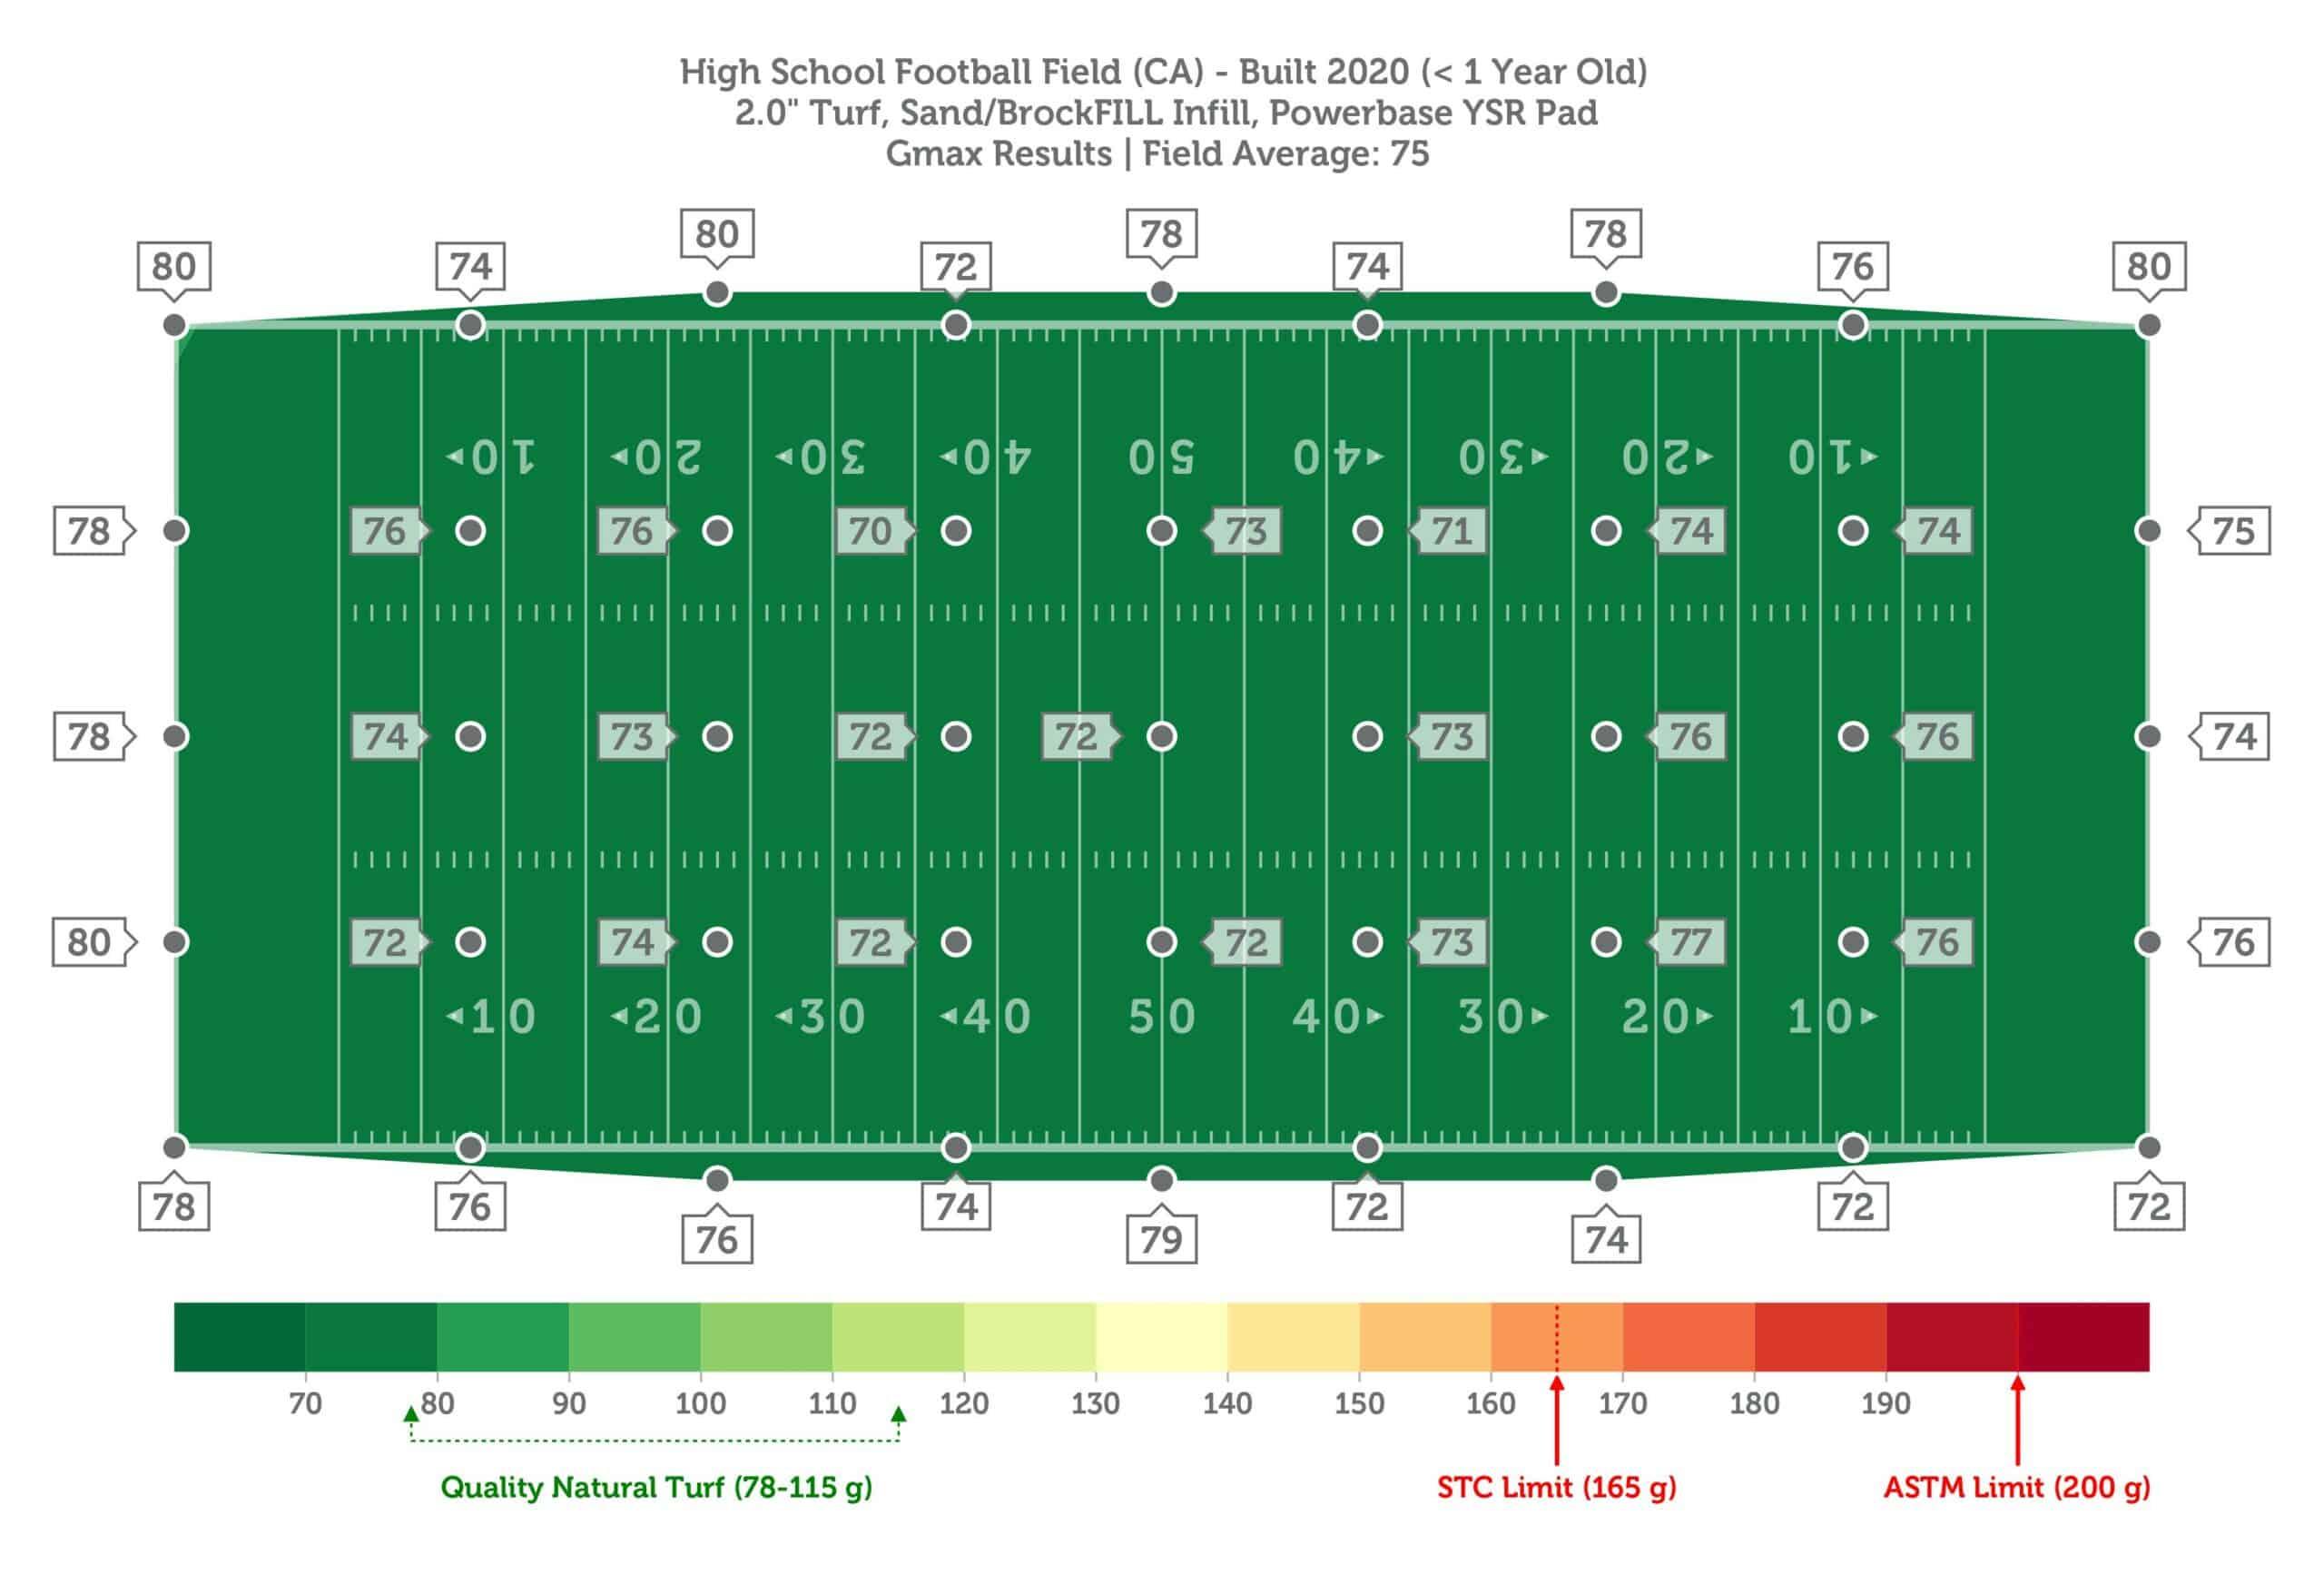 High School Football Field (CA), 0yo, Powerbase YSR Pad, Sand-BrockFILL, GMAX